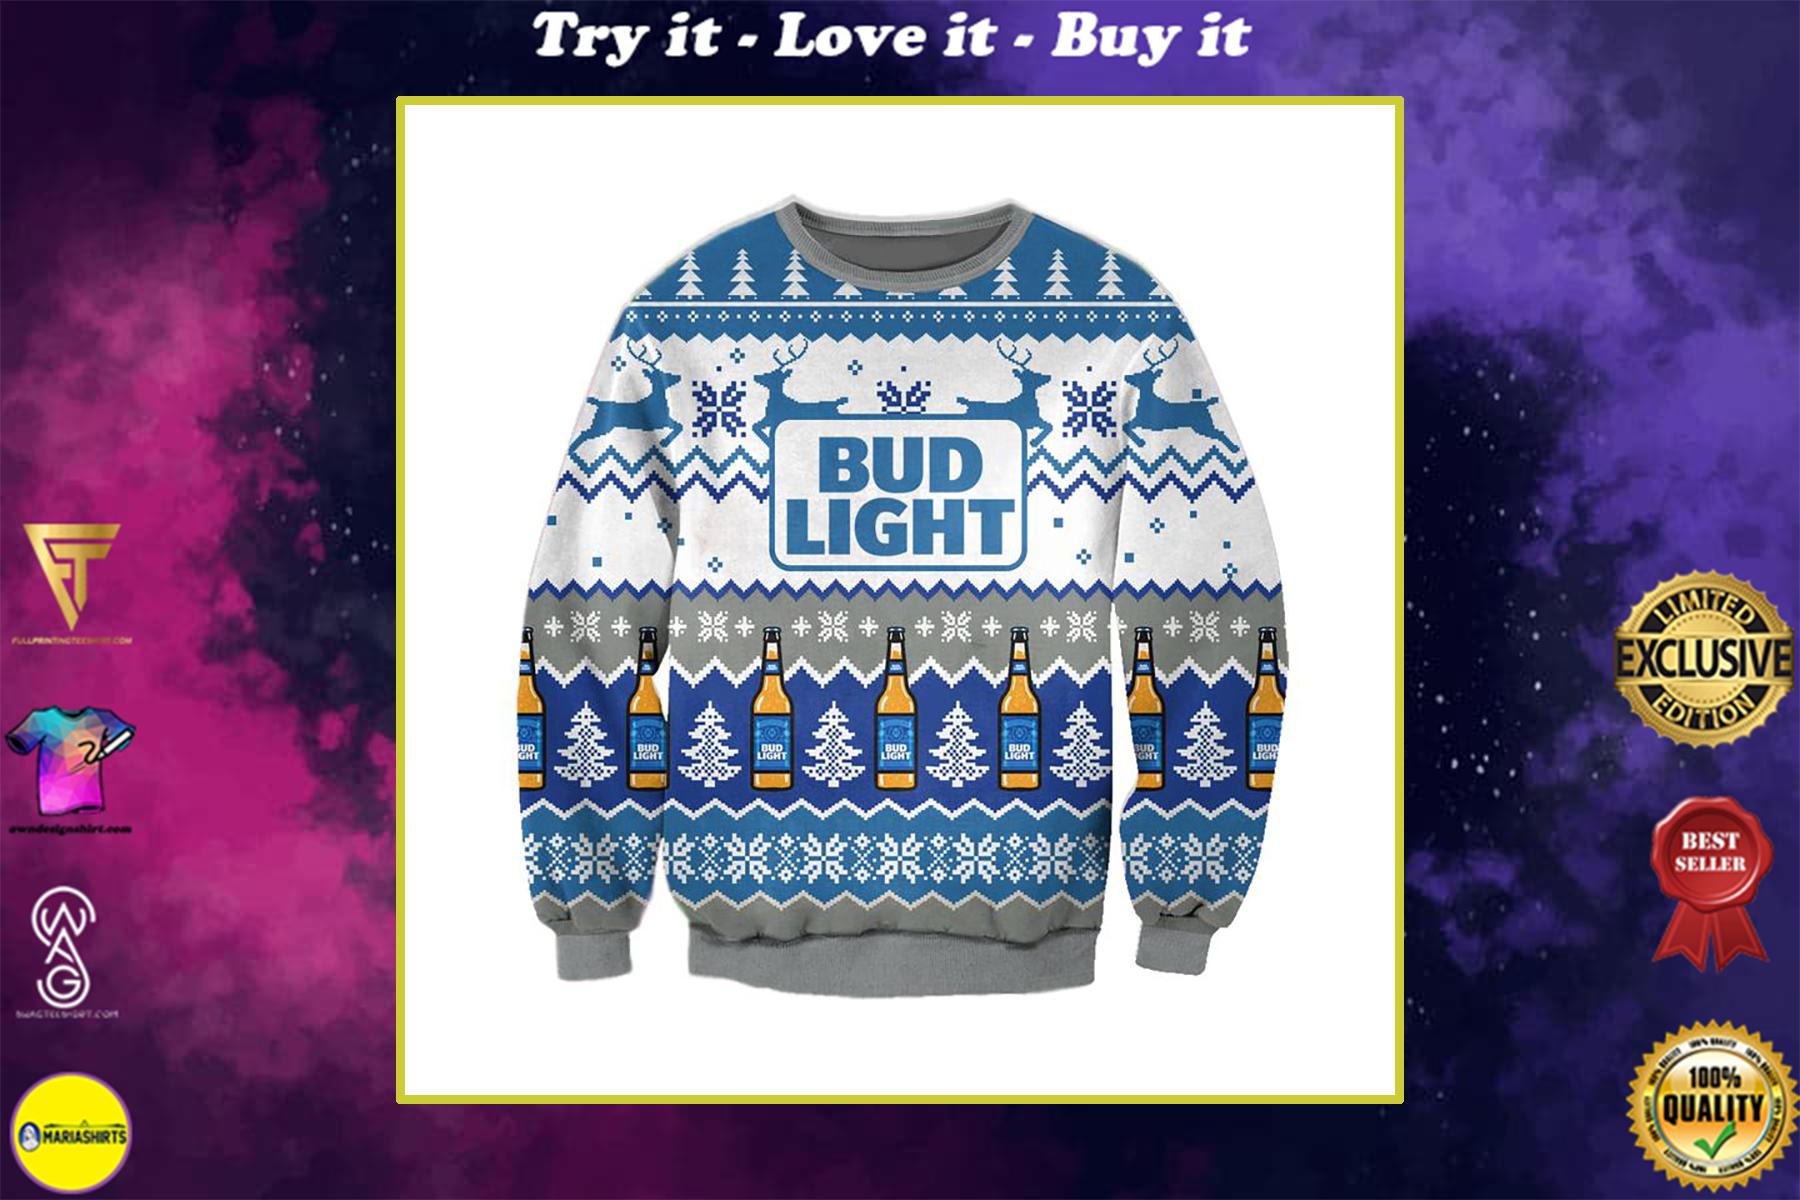 bud light beer full printing ugly christmas sweater